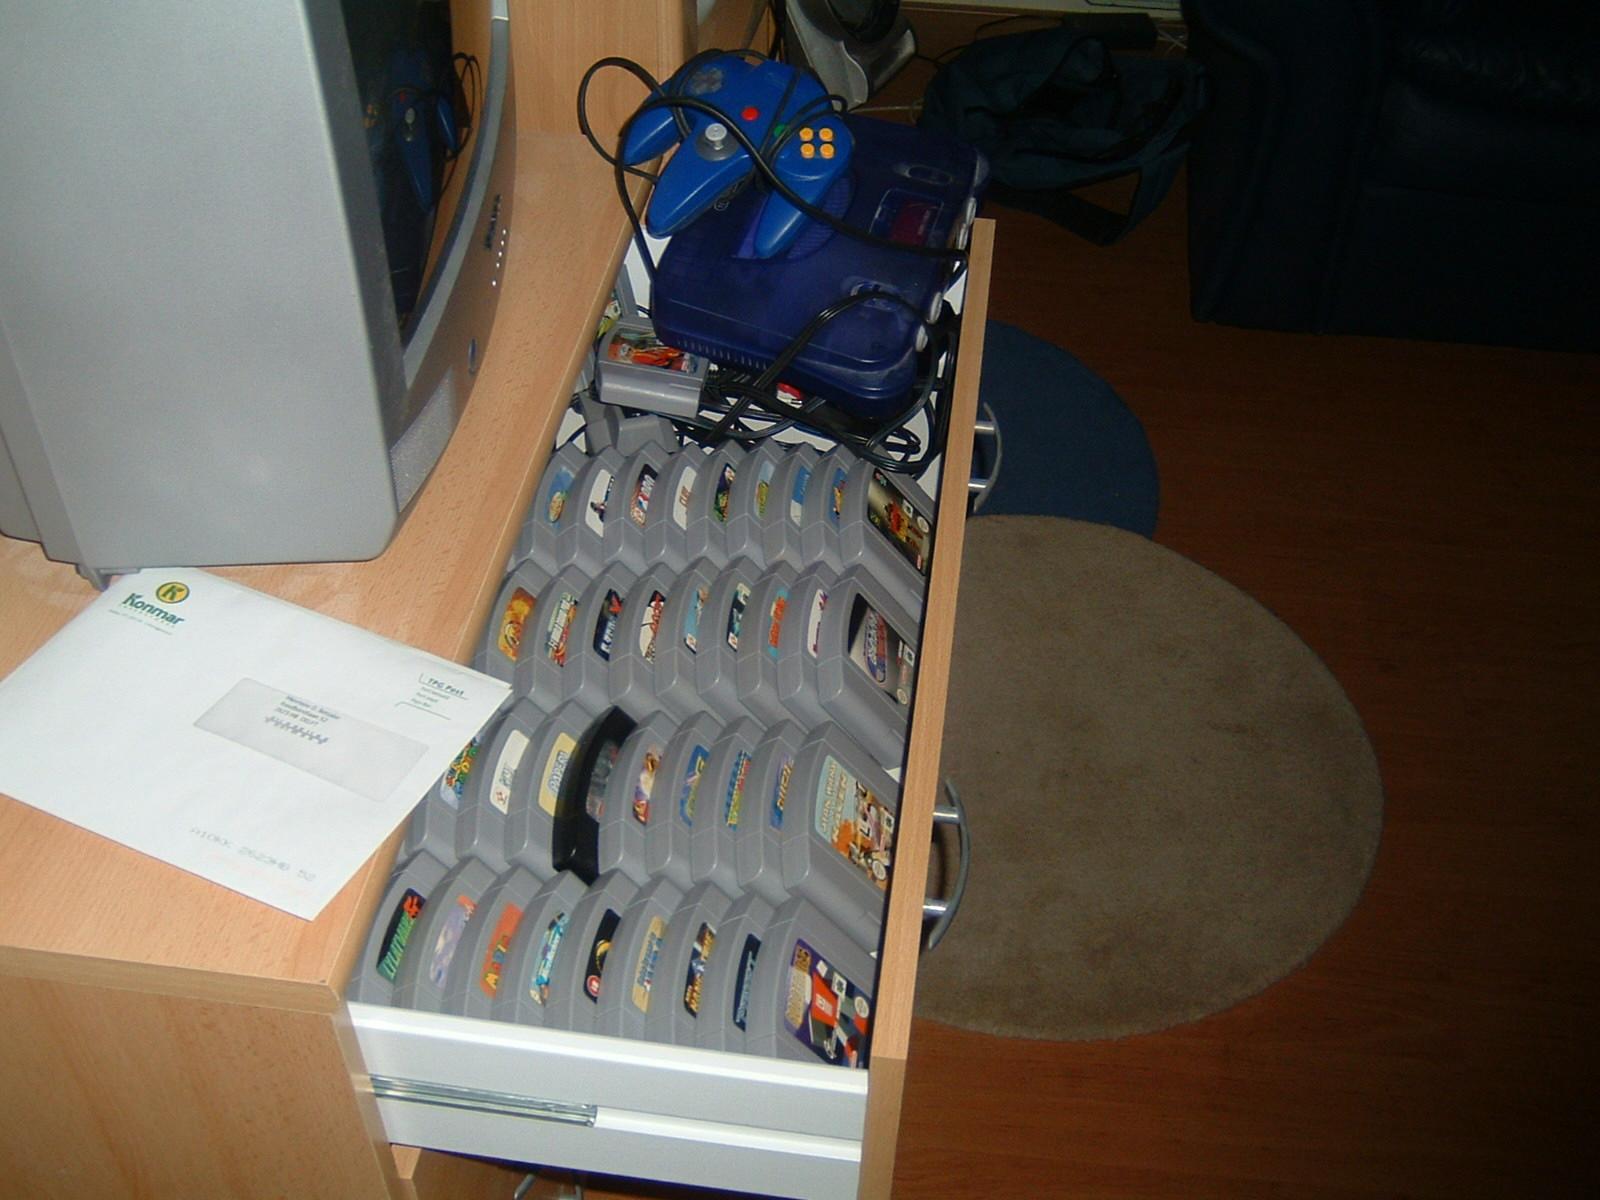 http://www.xs4all.nl/~volder/Consoleshit/N642.JPG